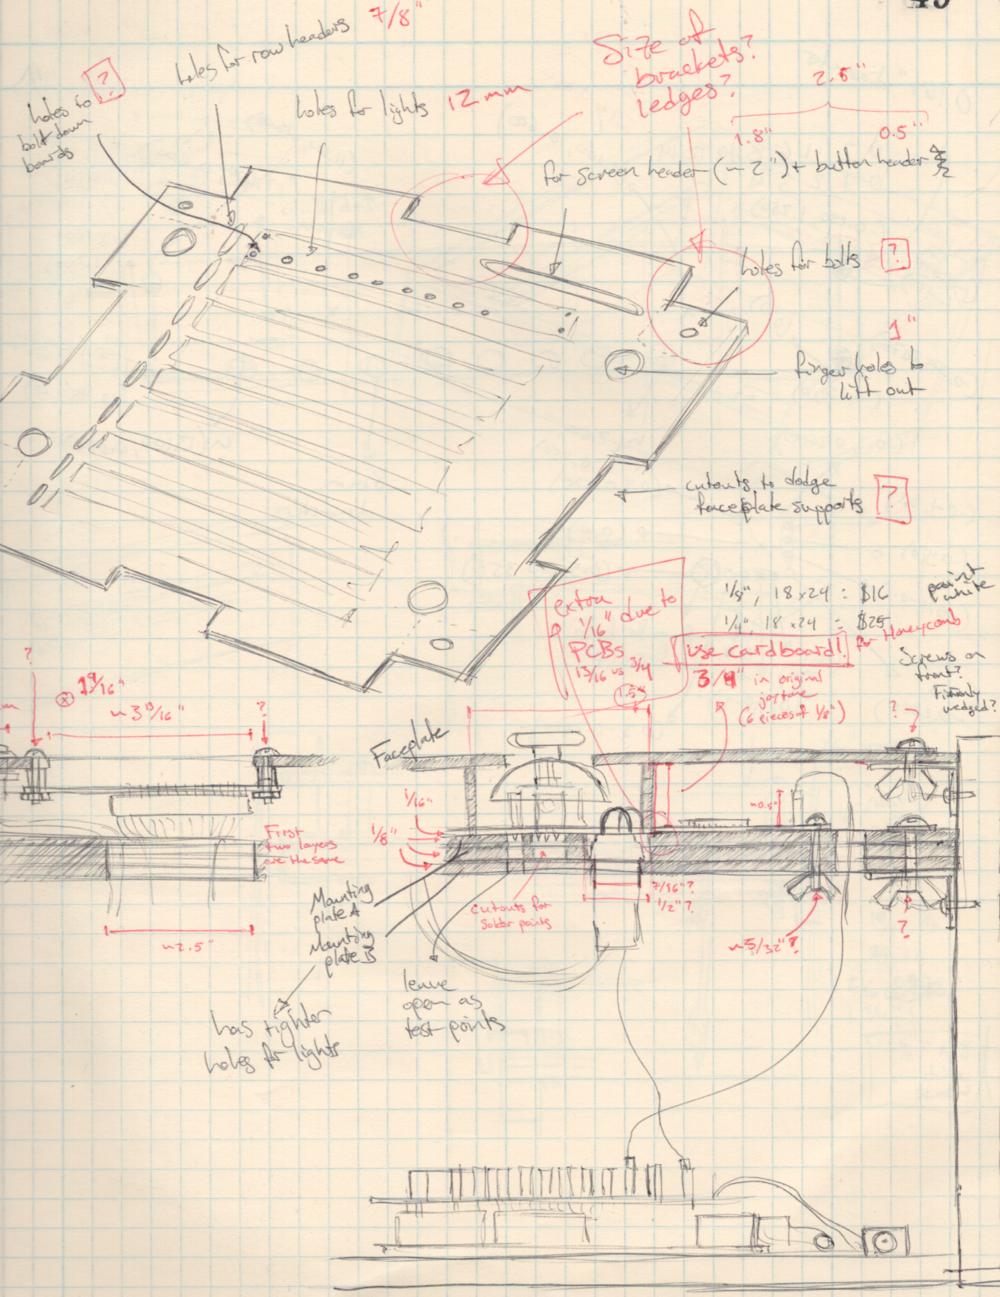 Joytone Sketches 3.png